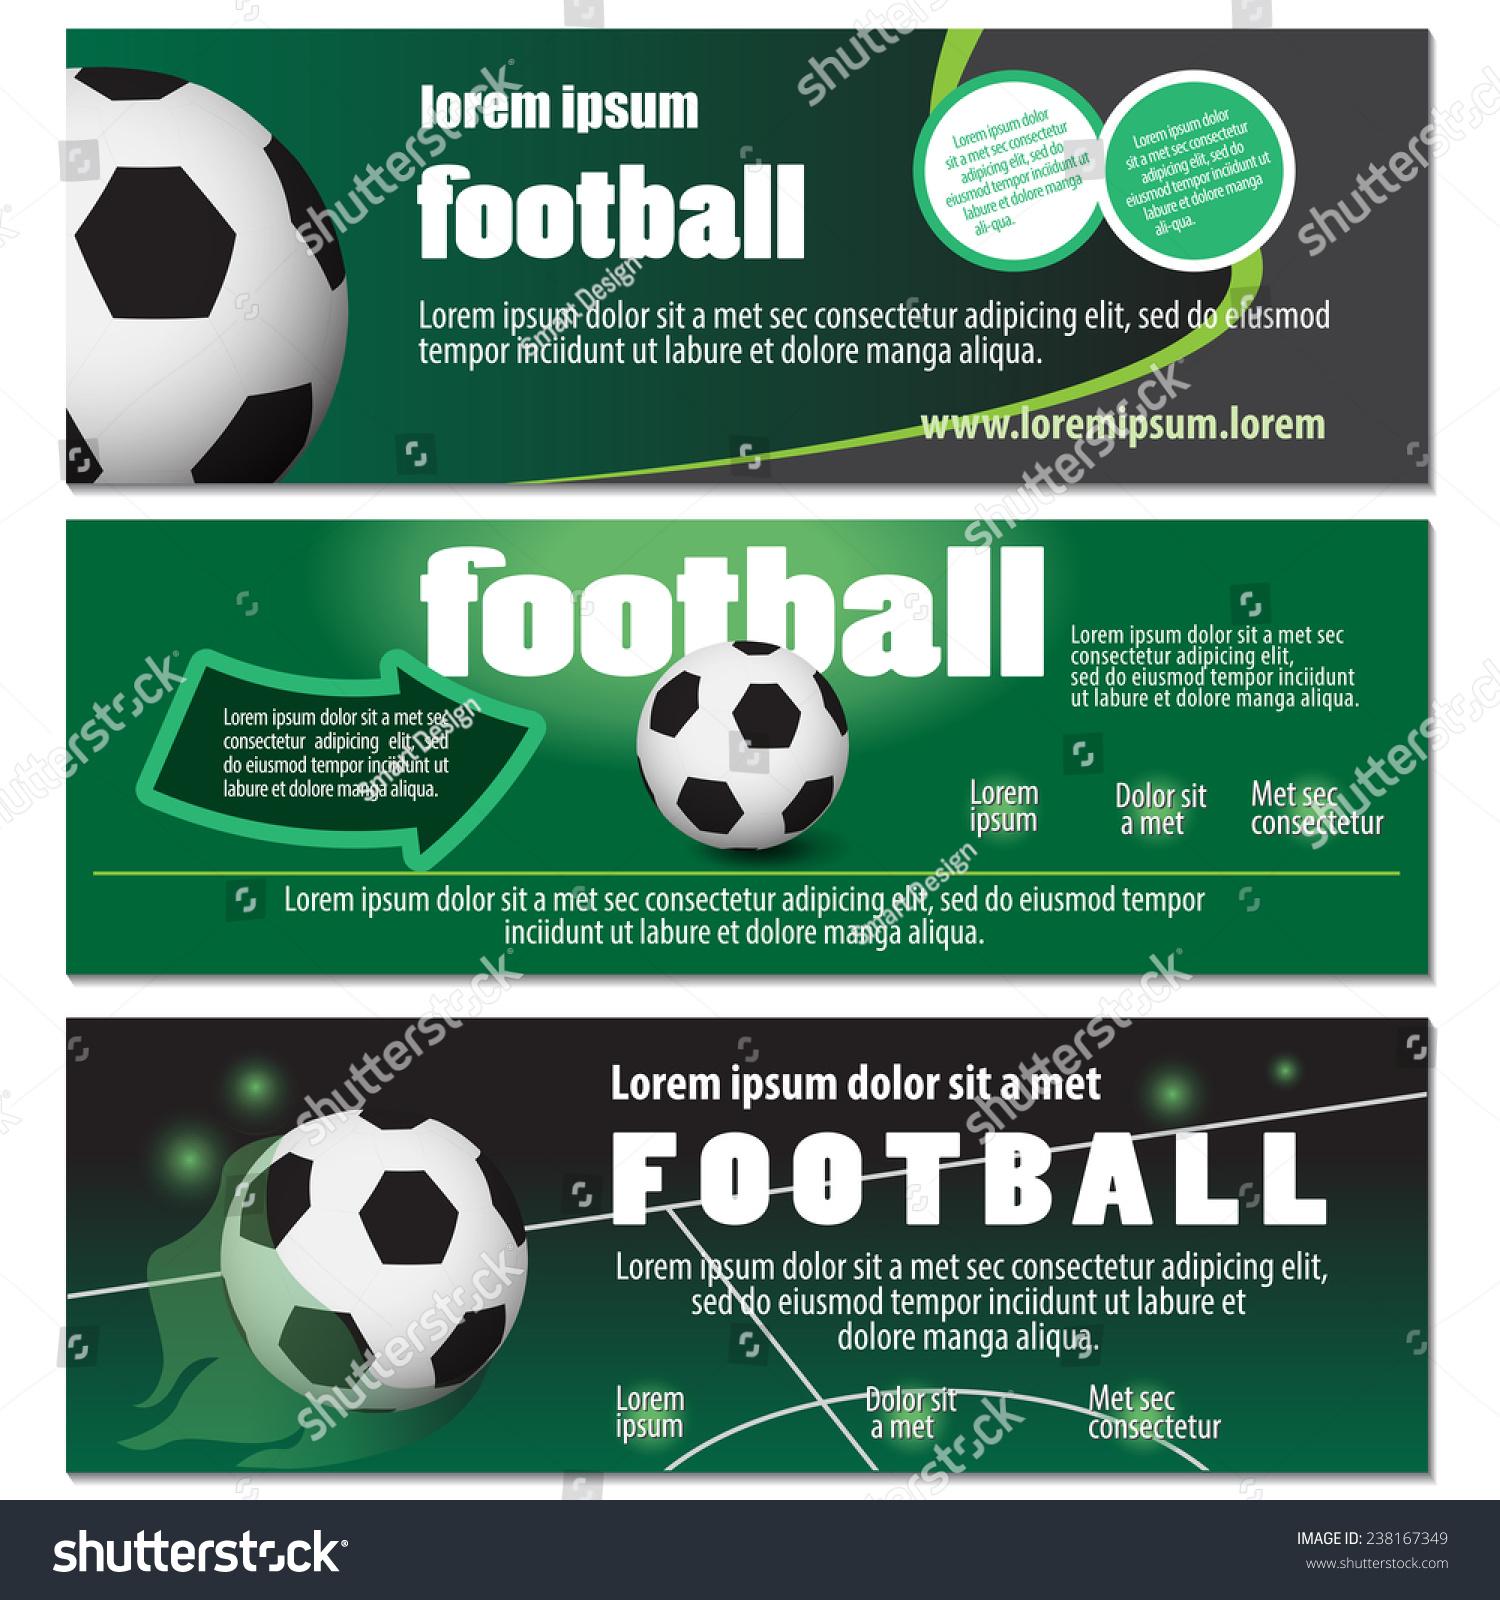 Football Flyer Template Vector Illustration Graphic Stock Vector 238167349 - Shutterstock